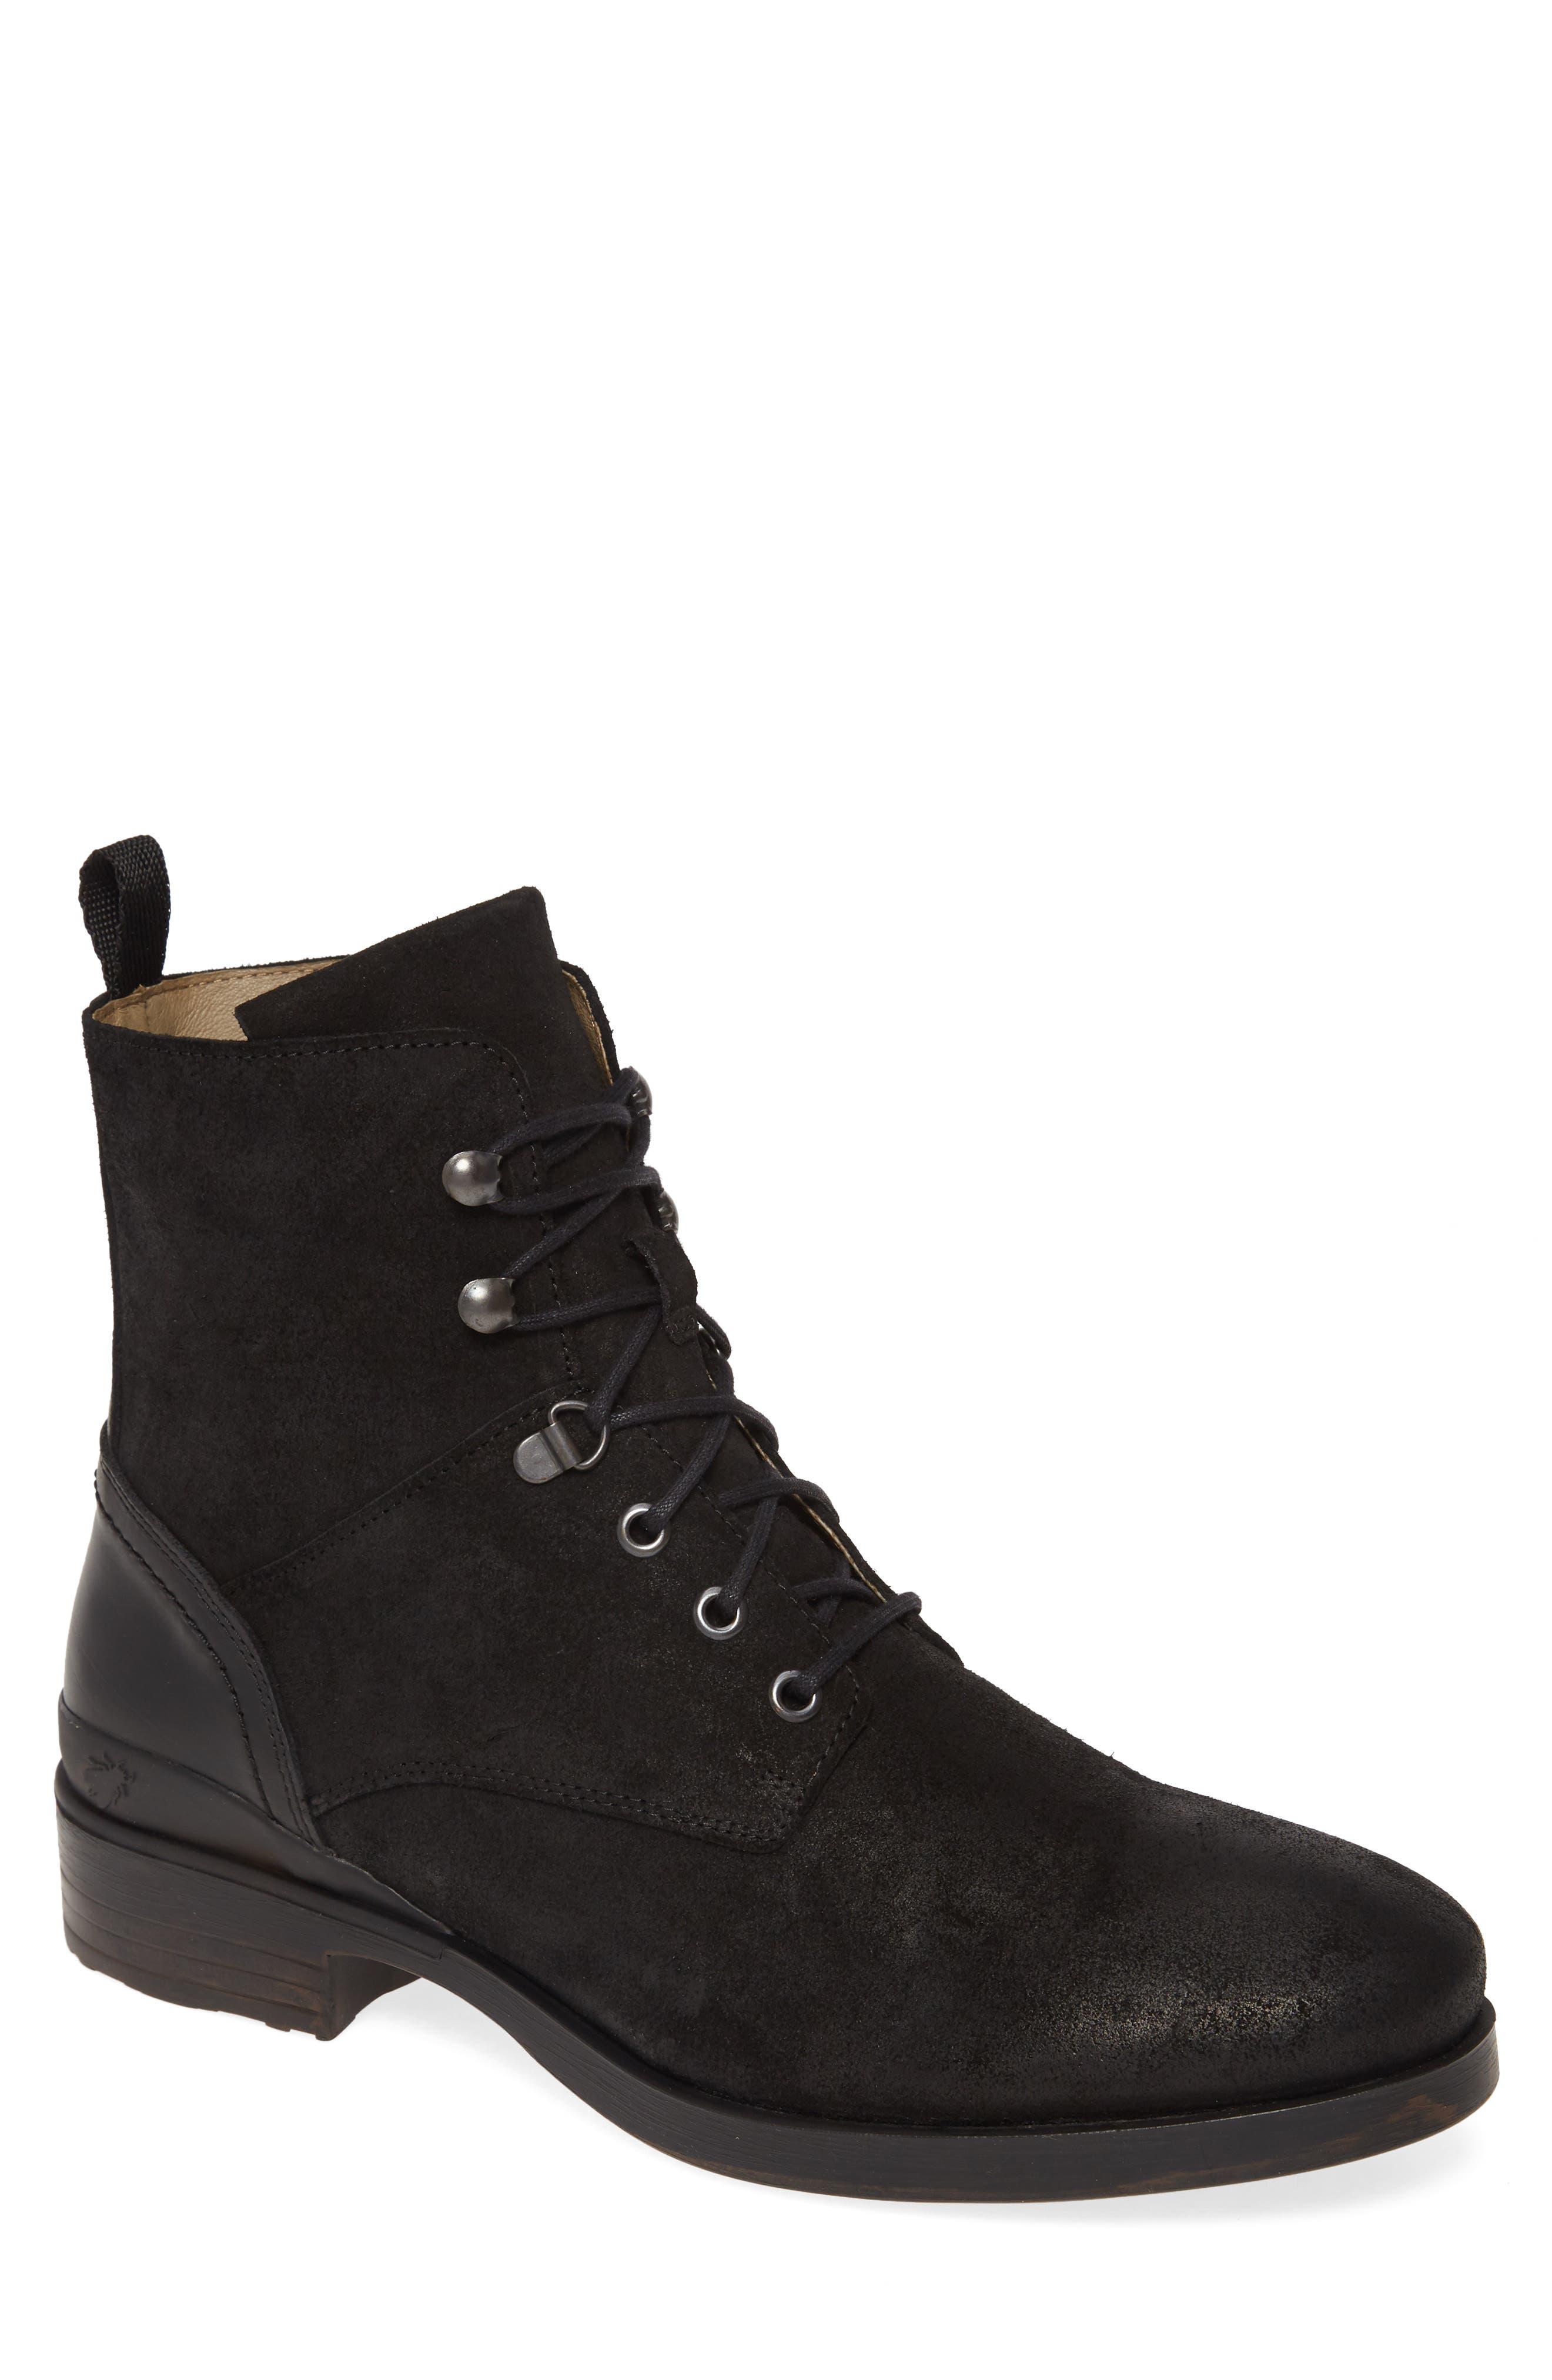 Mogo Plain Toe Boot